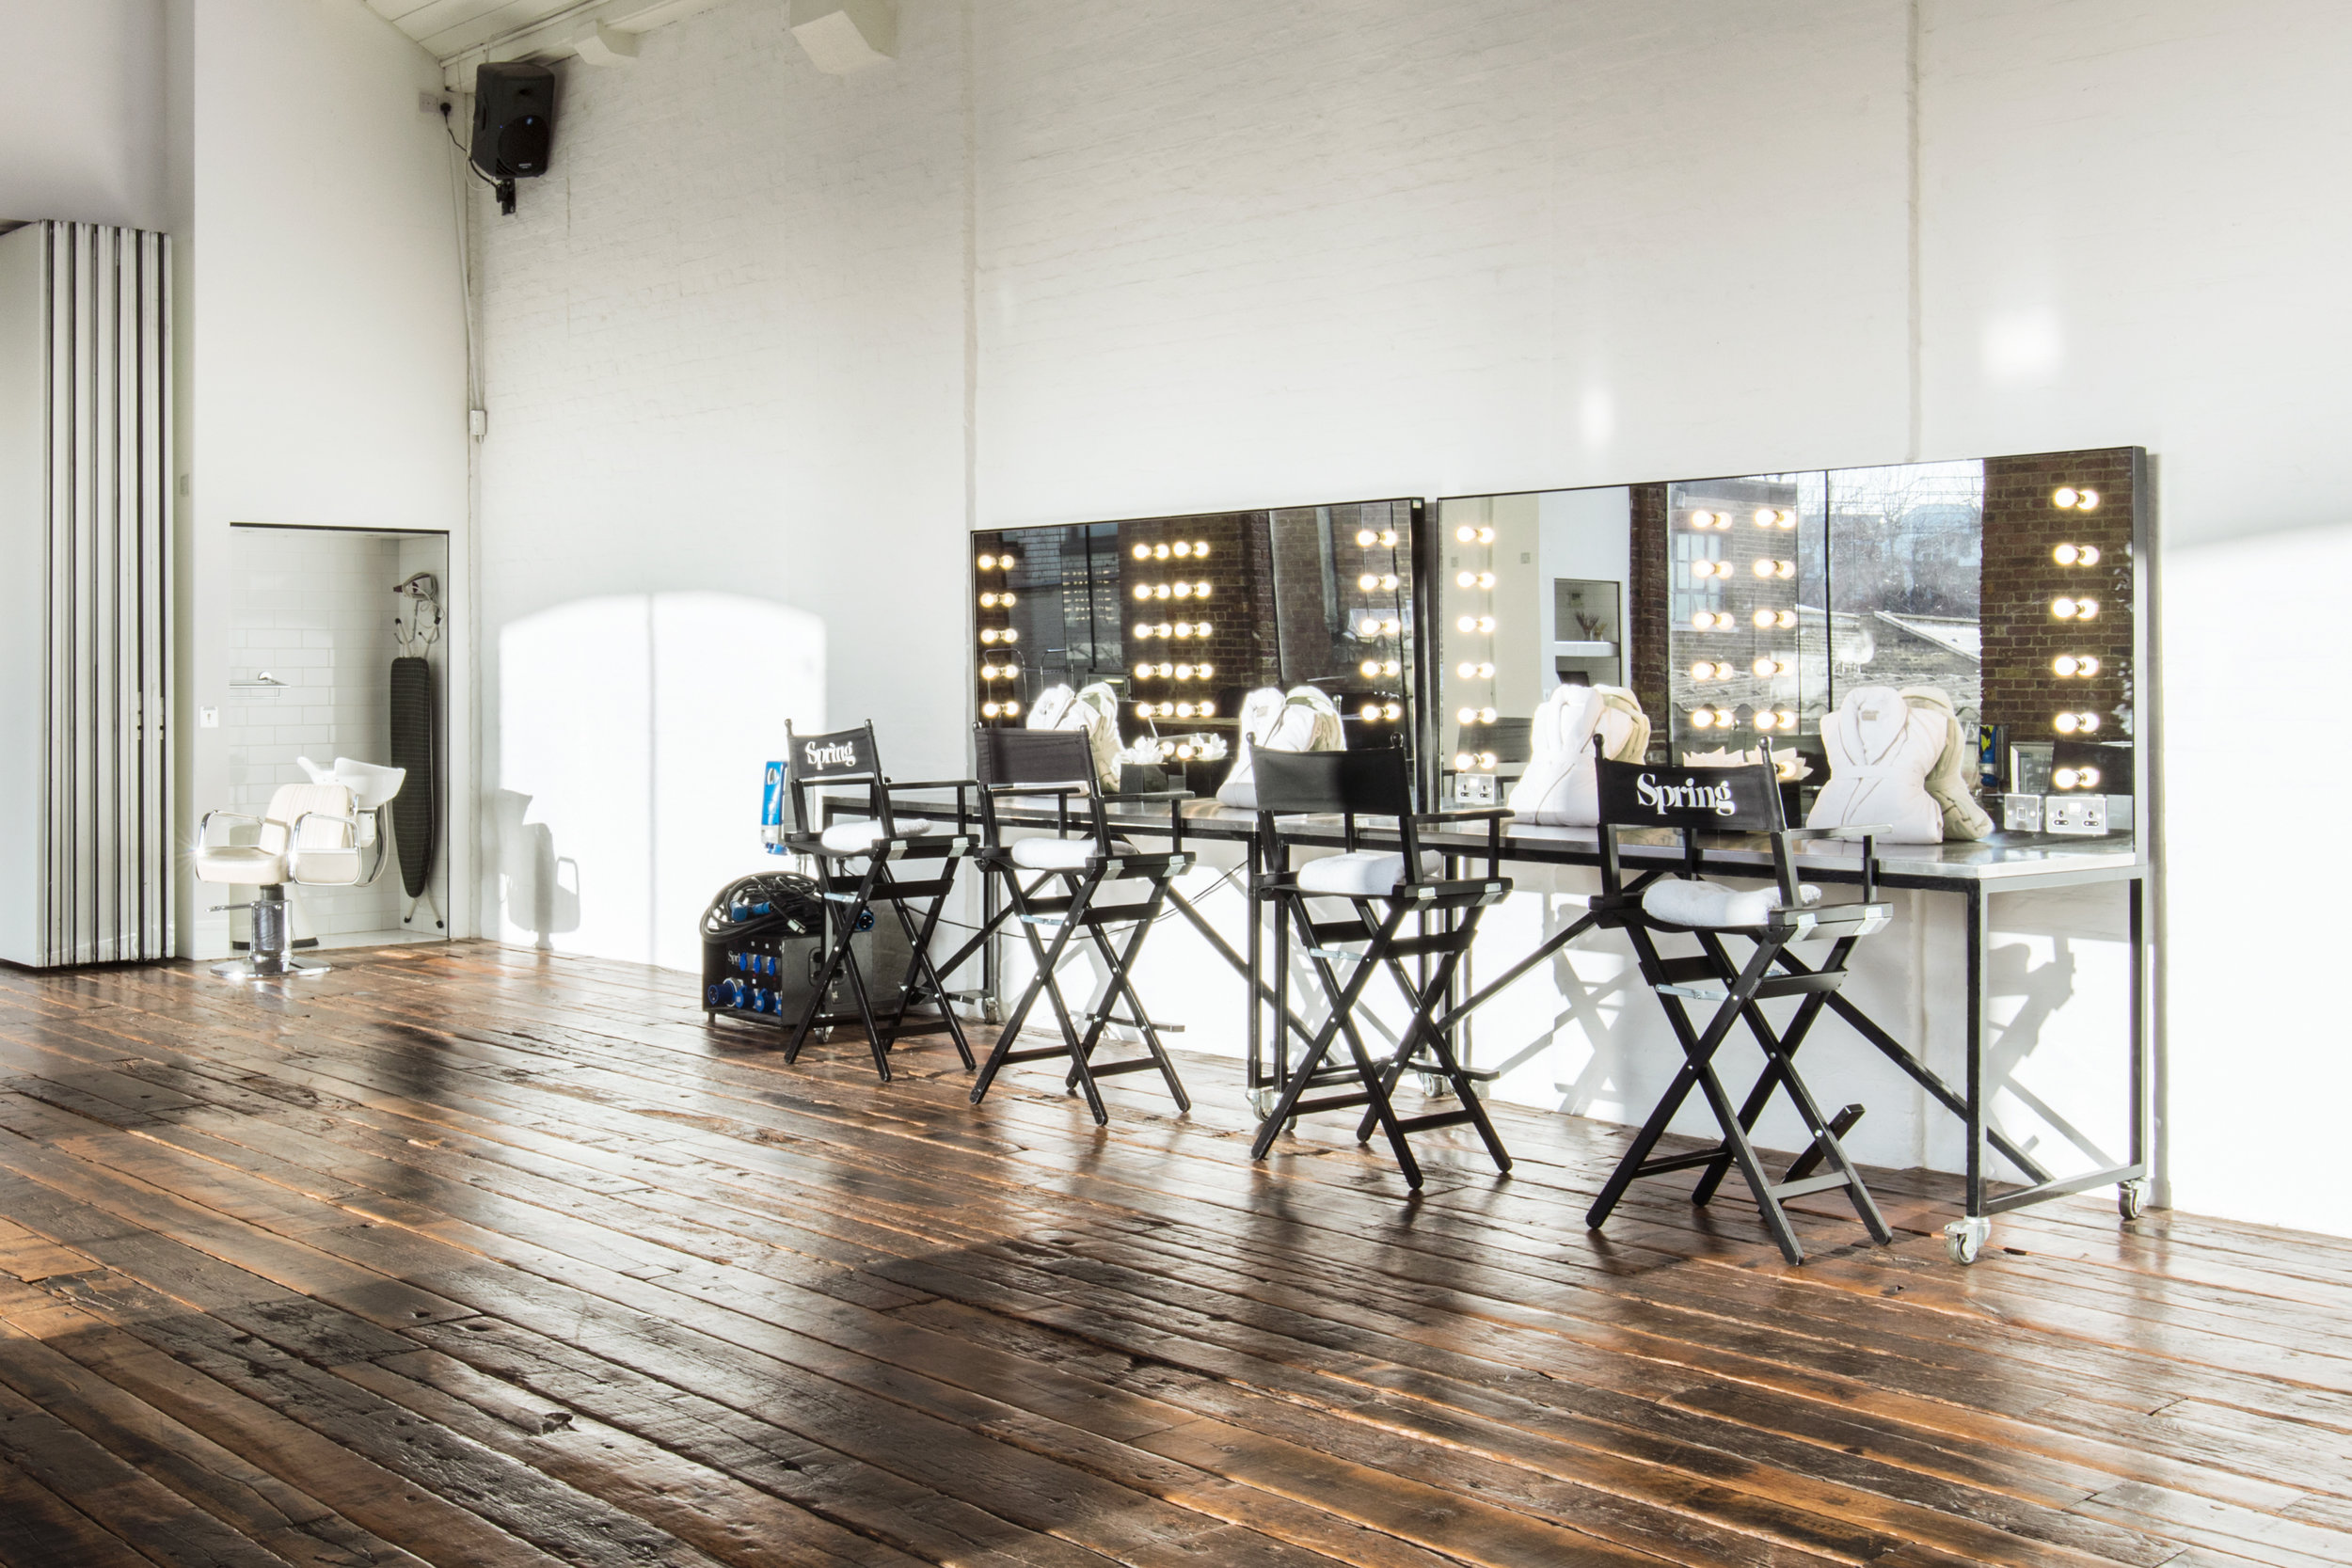 Studio B-C Make up-1.jpg